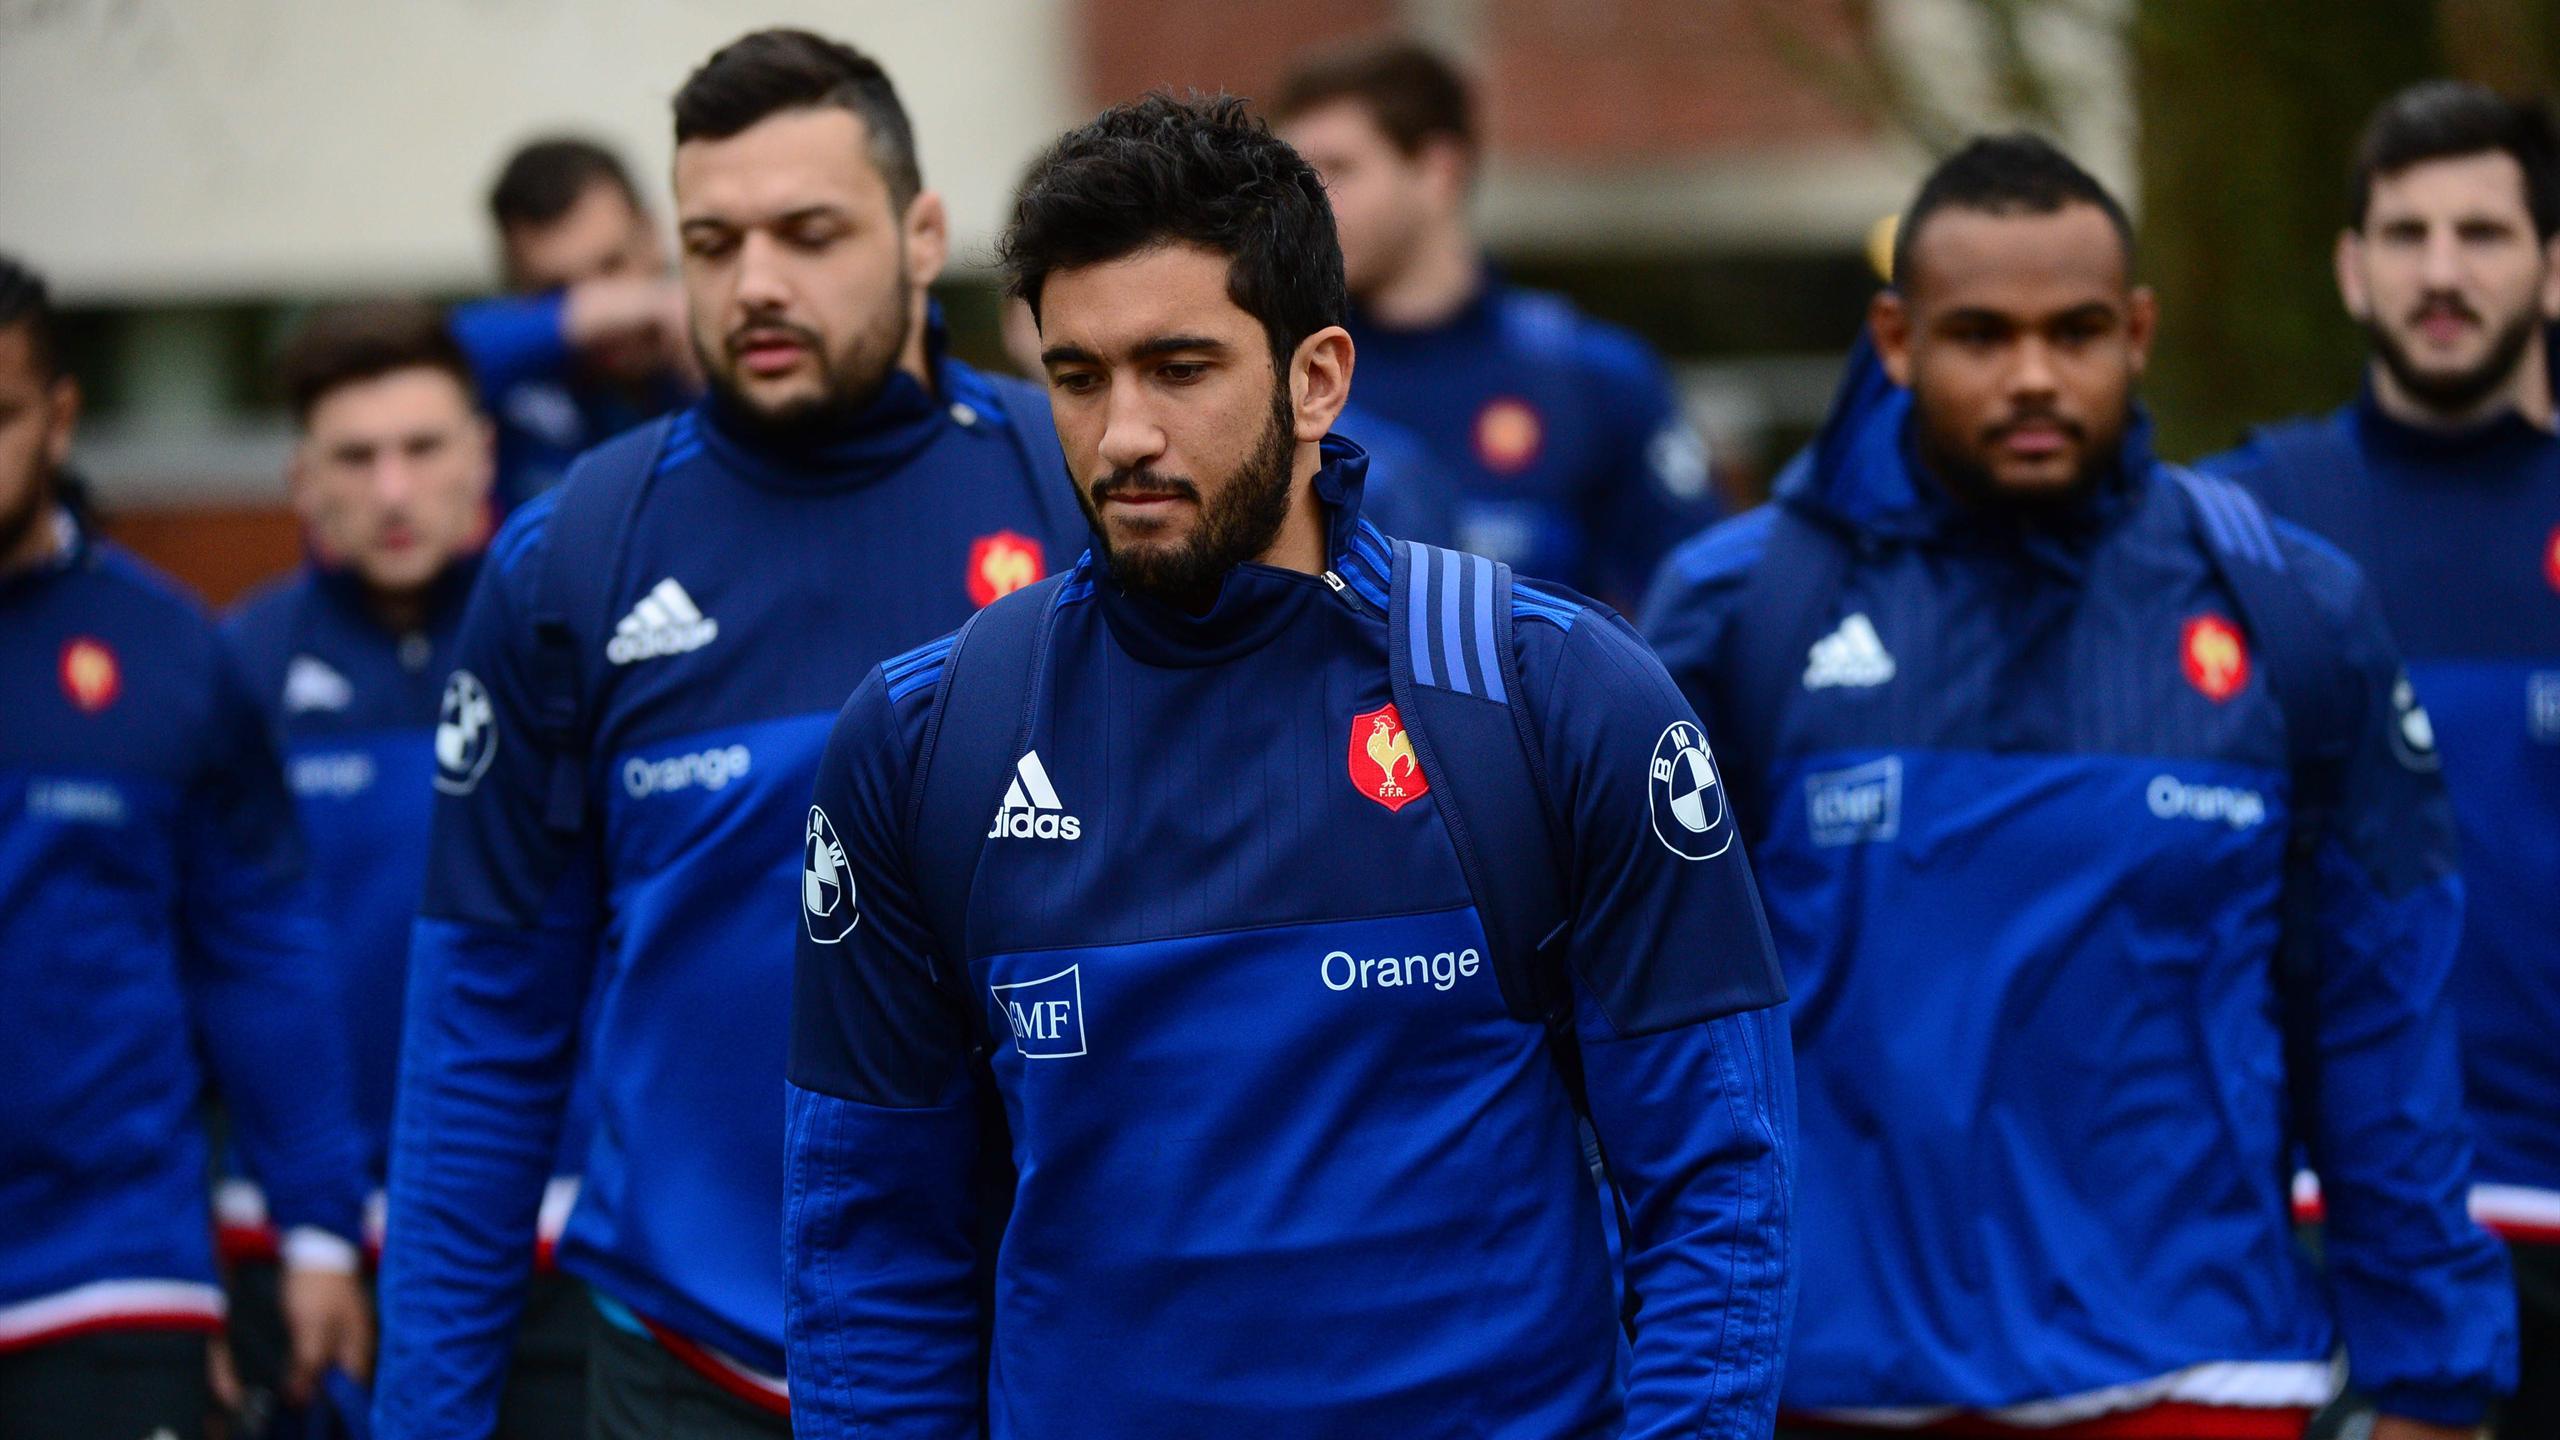 Maxime Mermoz (XV de France) - 9 février 2016